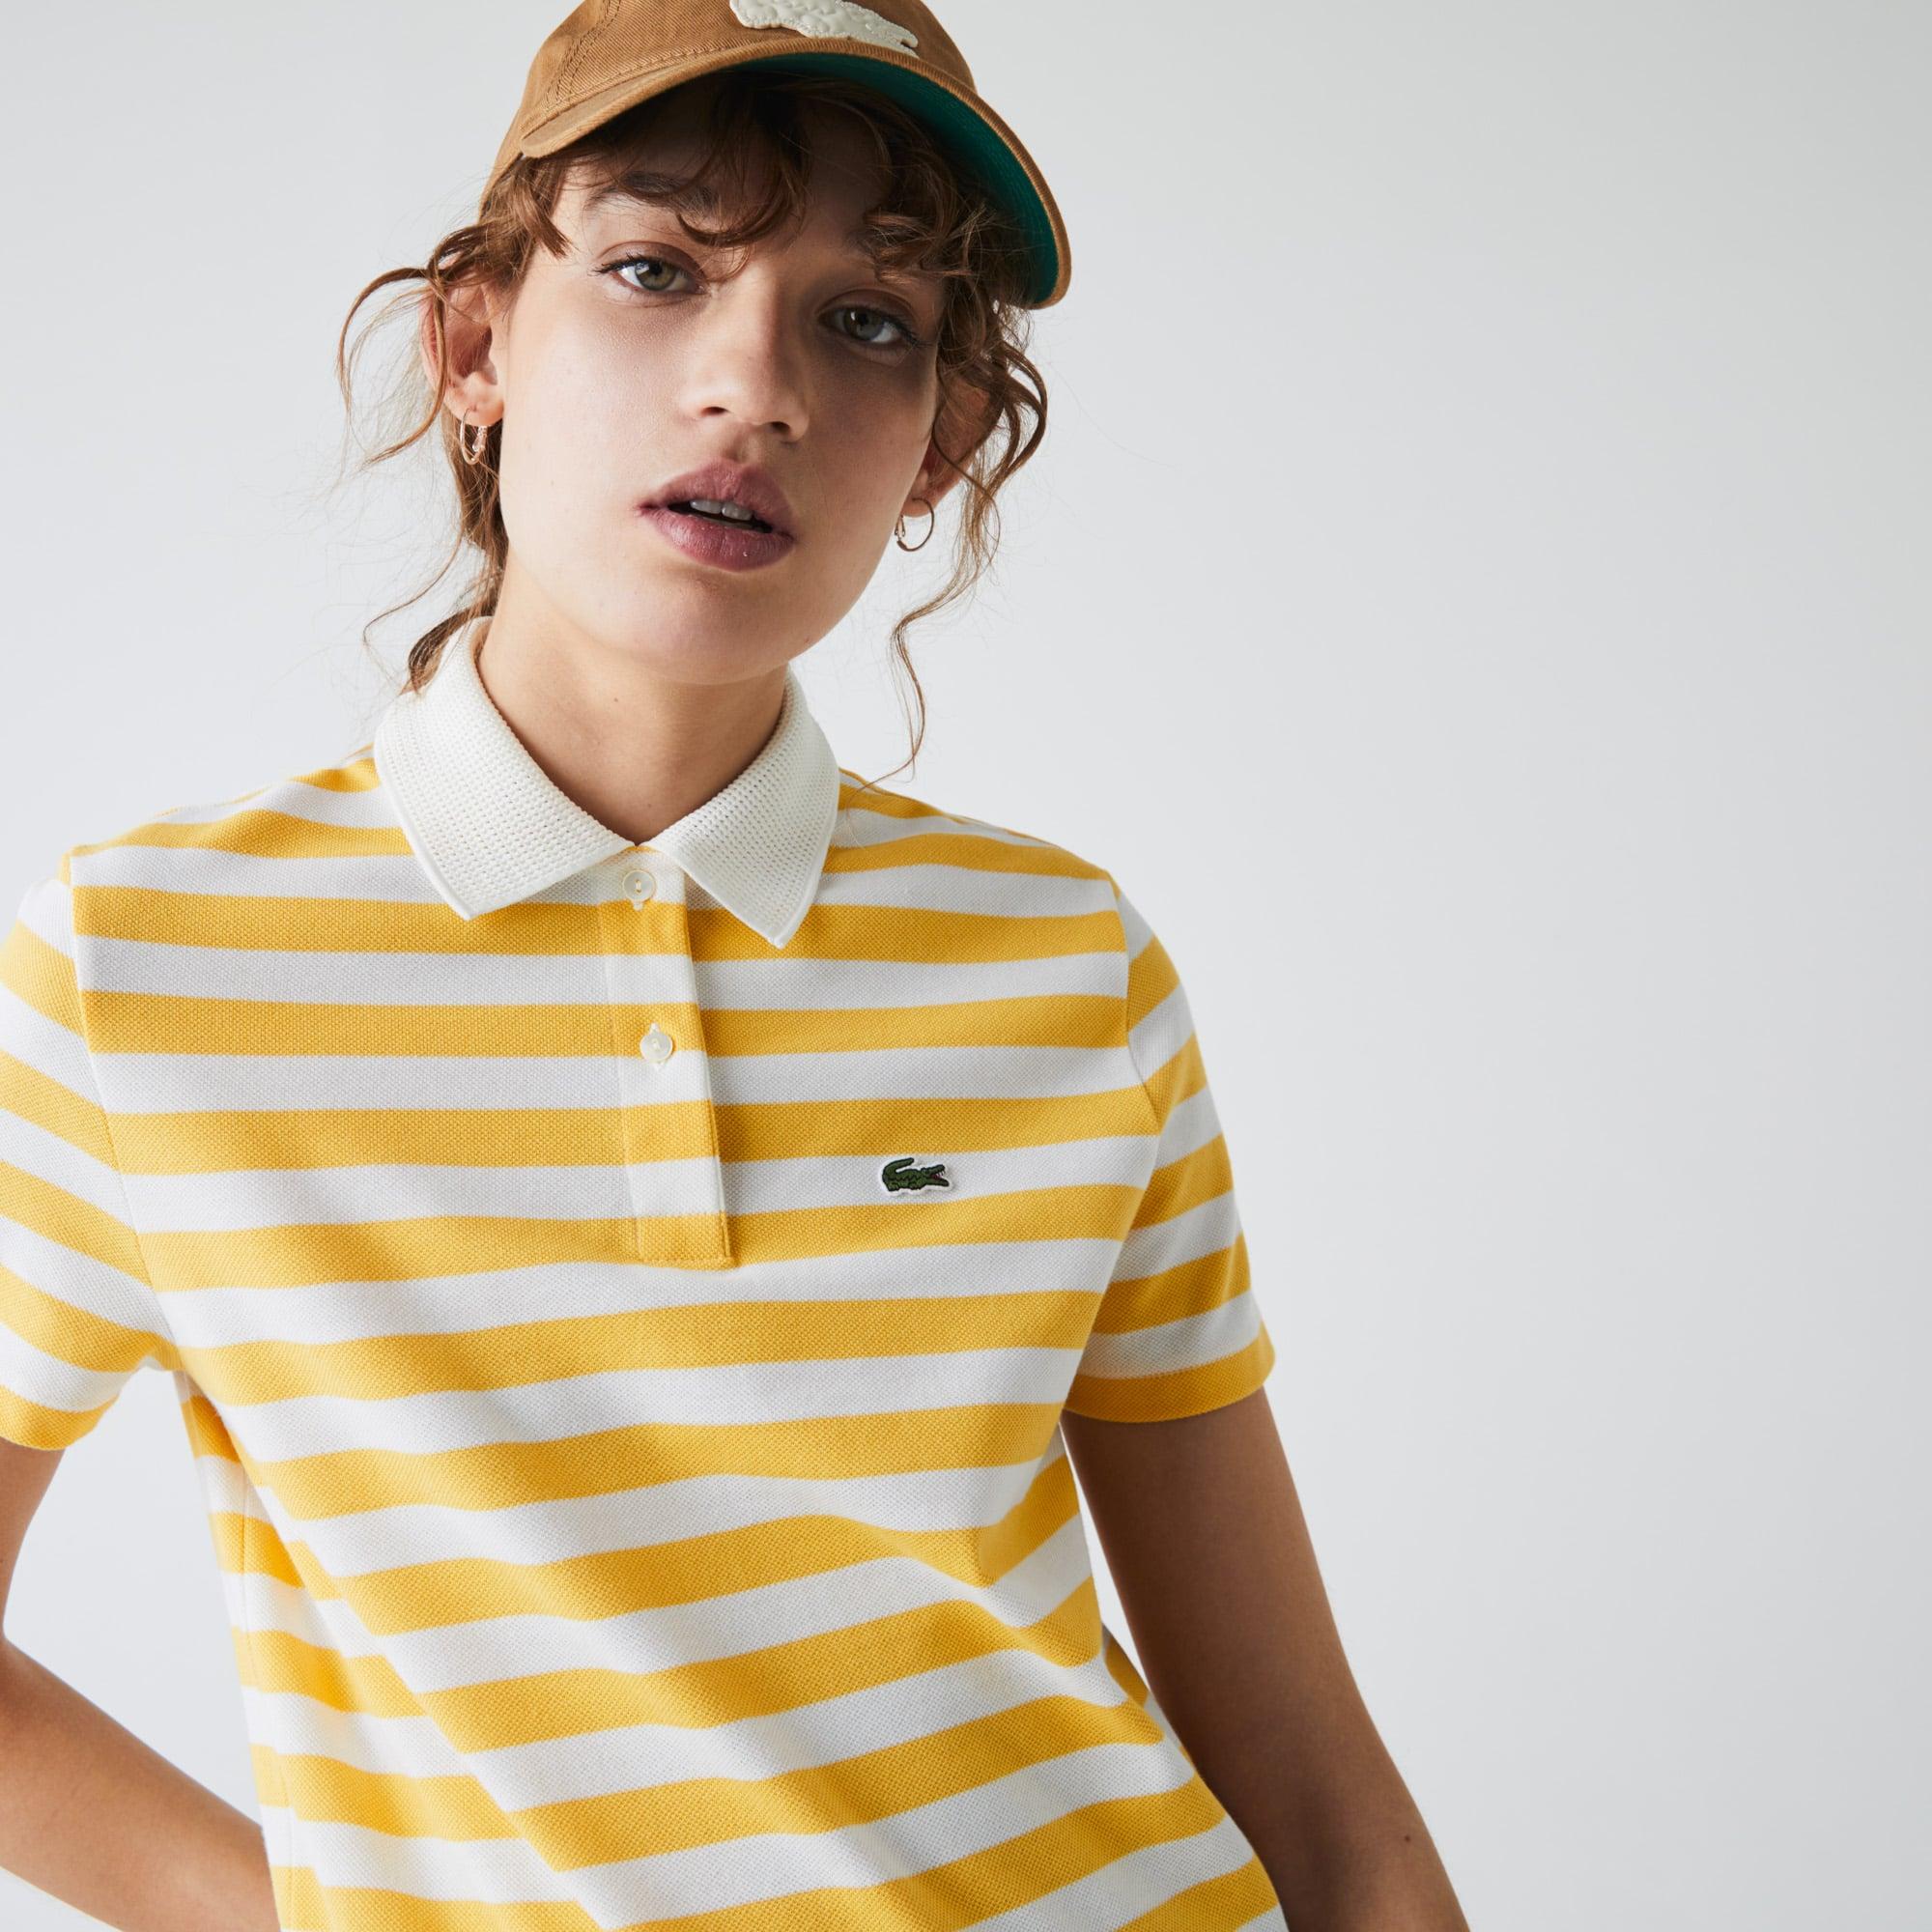 Polo Shirts for Women   Lacoste Women's Polo Shirts   LACOSTE